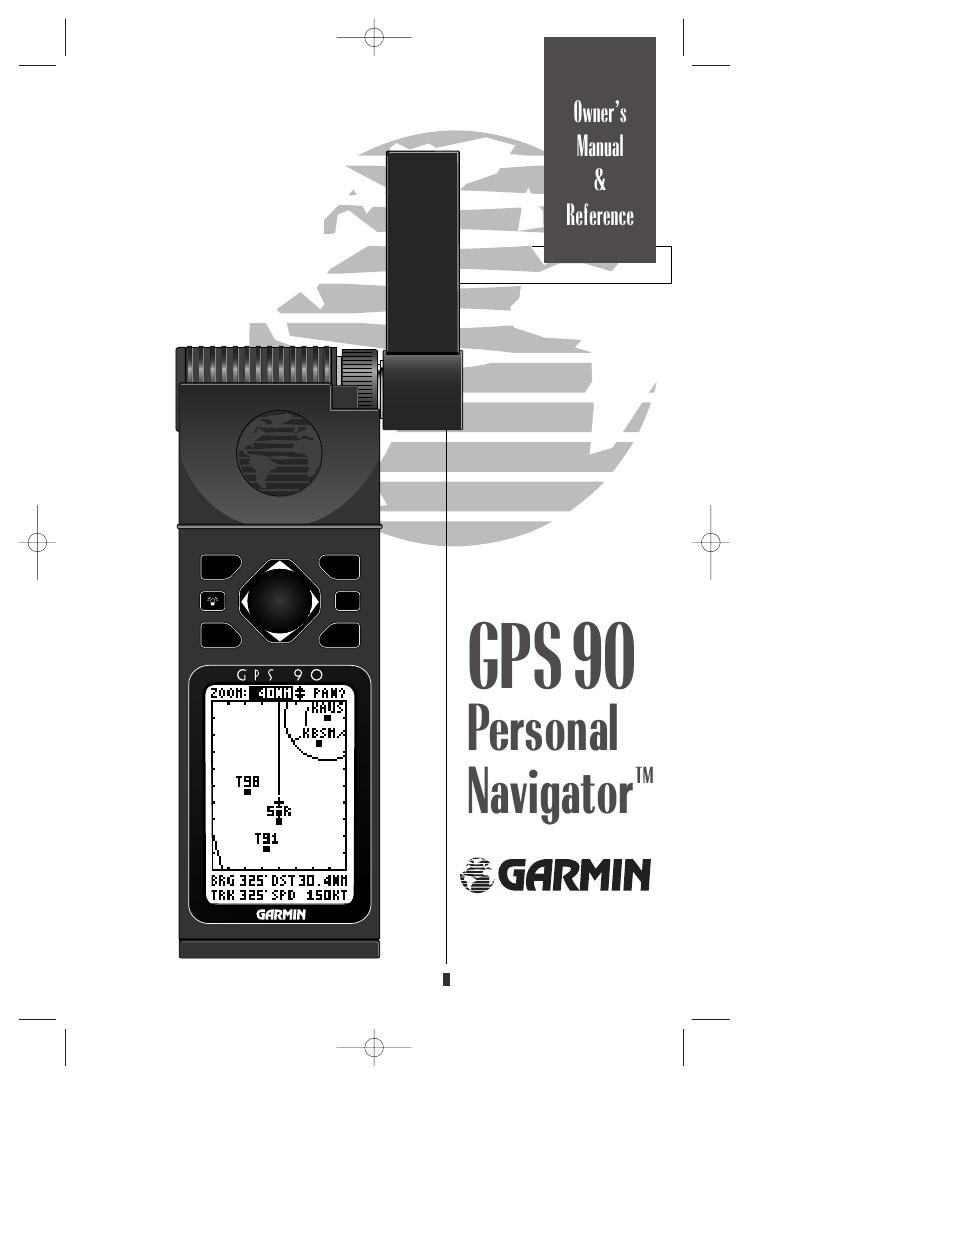 garmin gps 90 user manual 92 pages garmin gps v manual español garmin gps v manual español